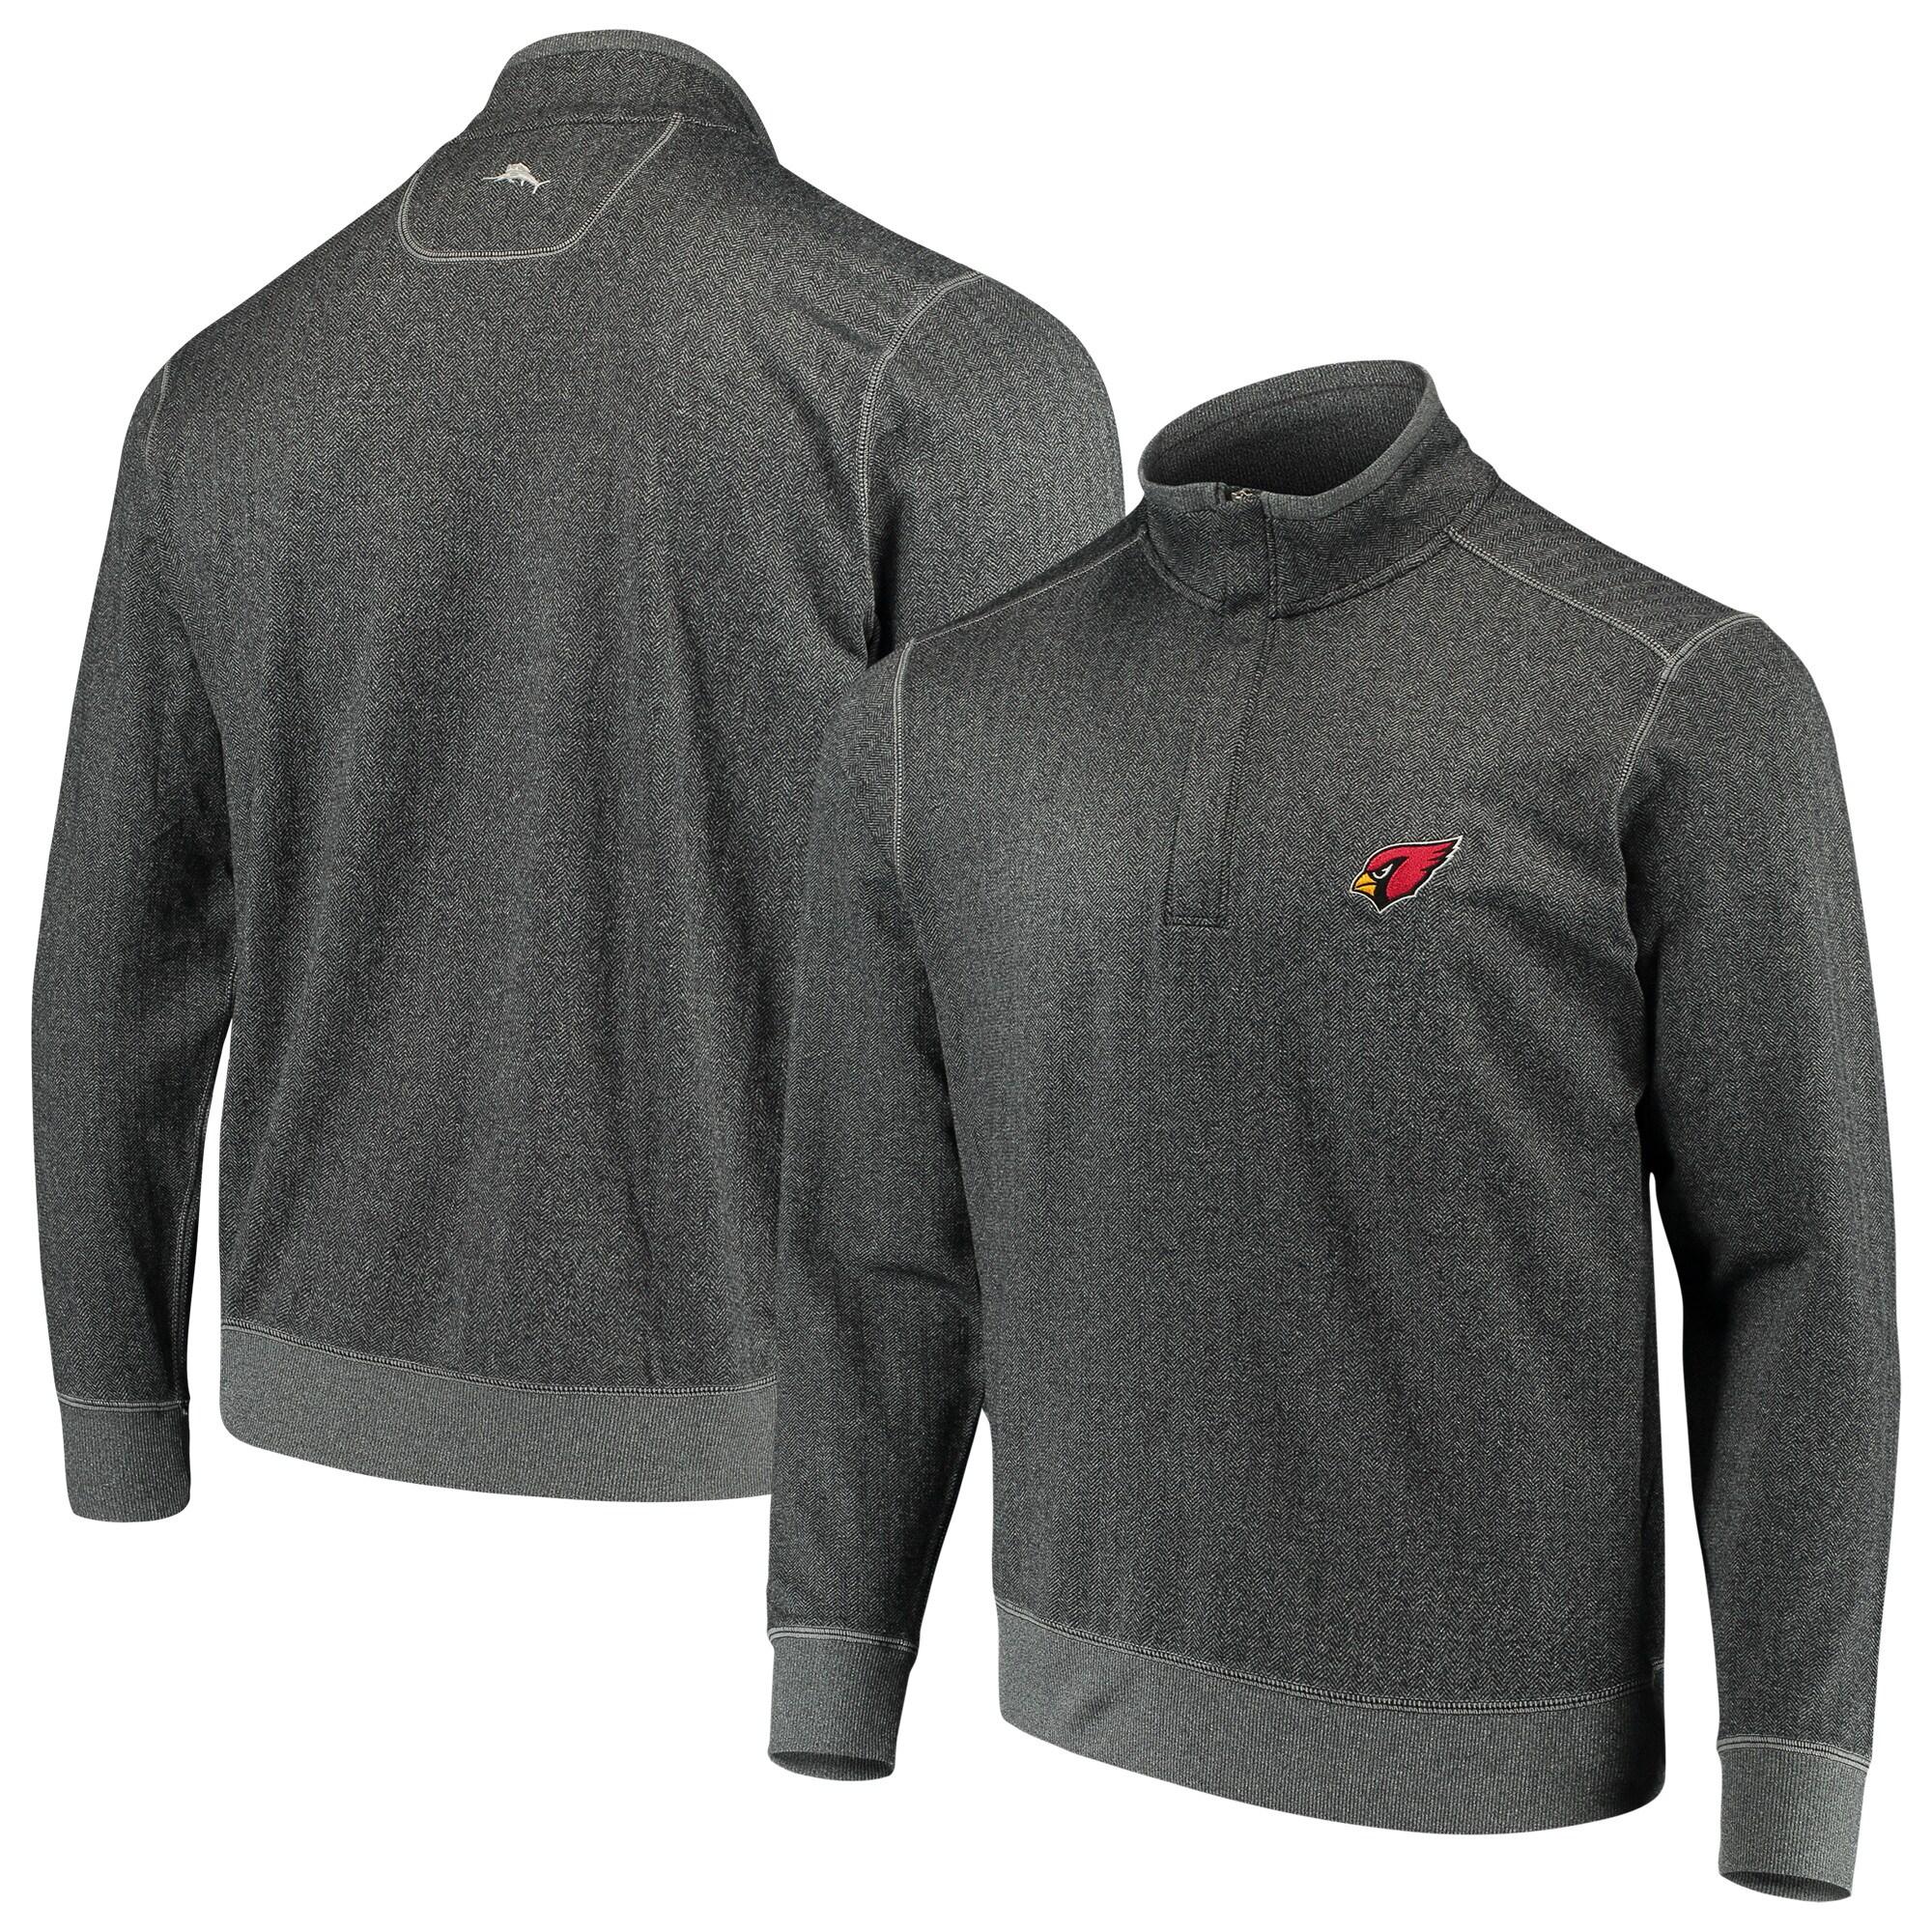 Arizona Cardinals Tommy Bahama ProFormance Half-Zip Pullover Jacket - Heathered Charcoal